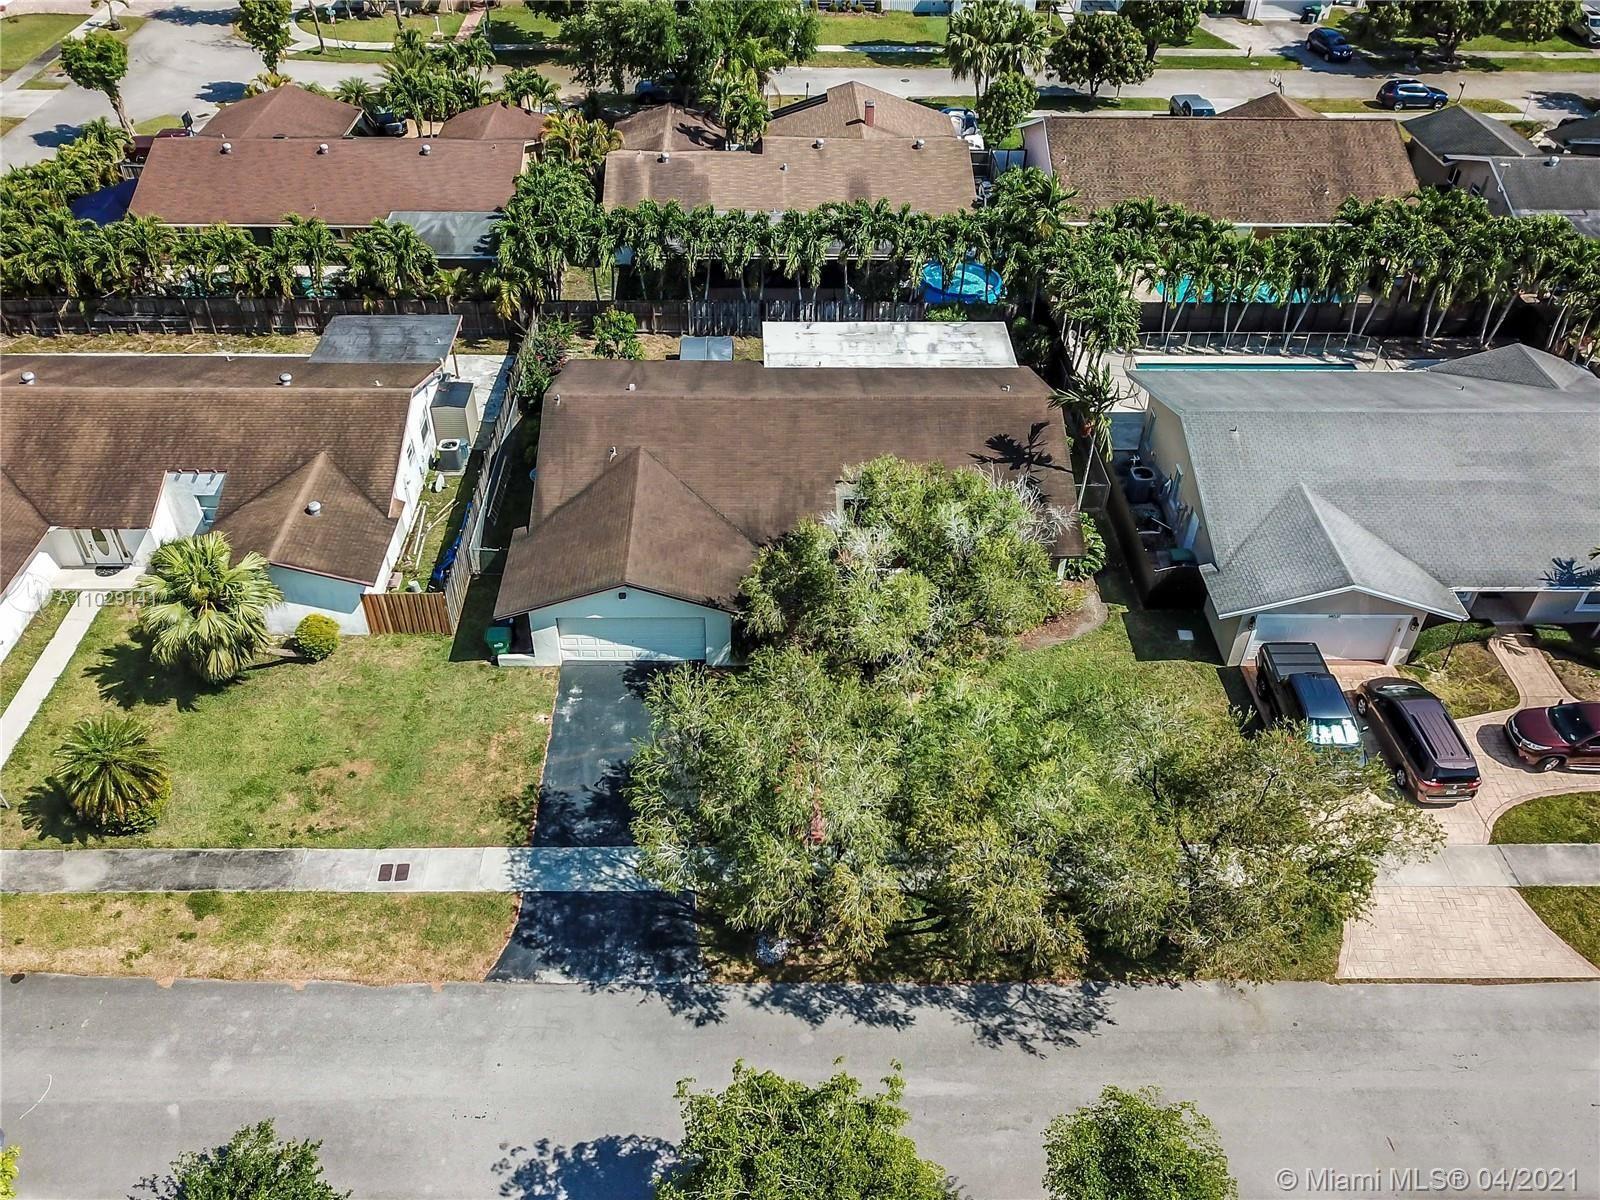 Photo of 14041 SW 106th St, Miami, FL 33186 (MLS # A11029141)